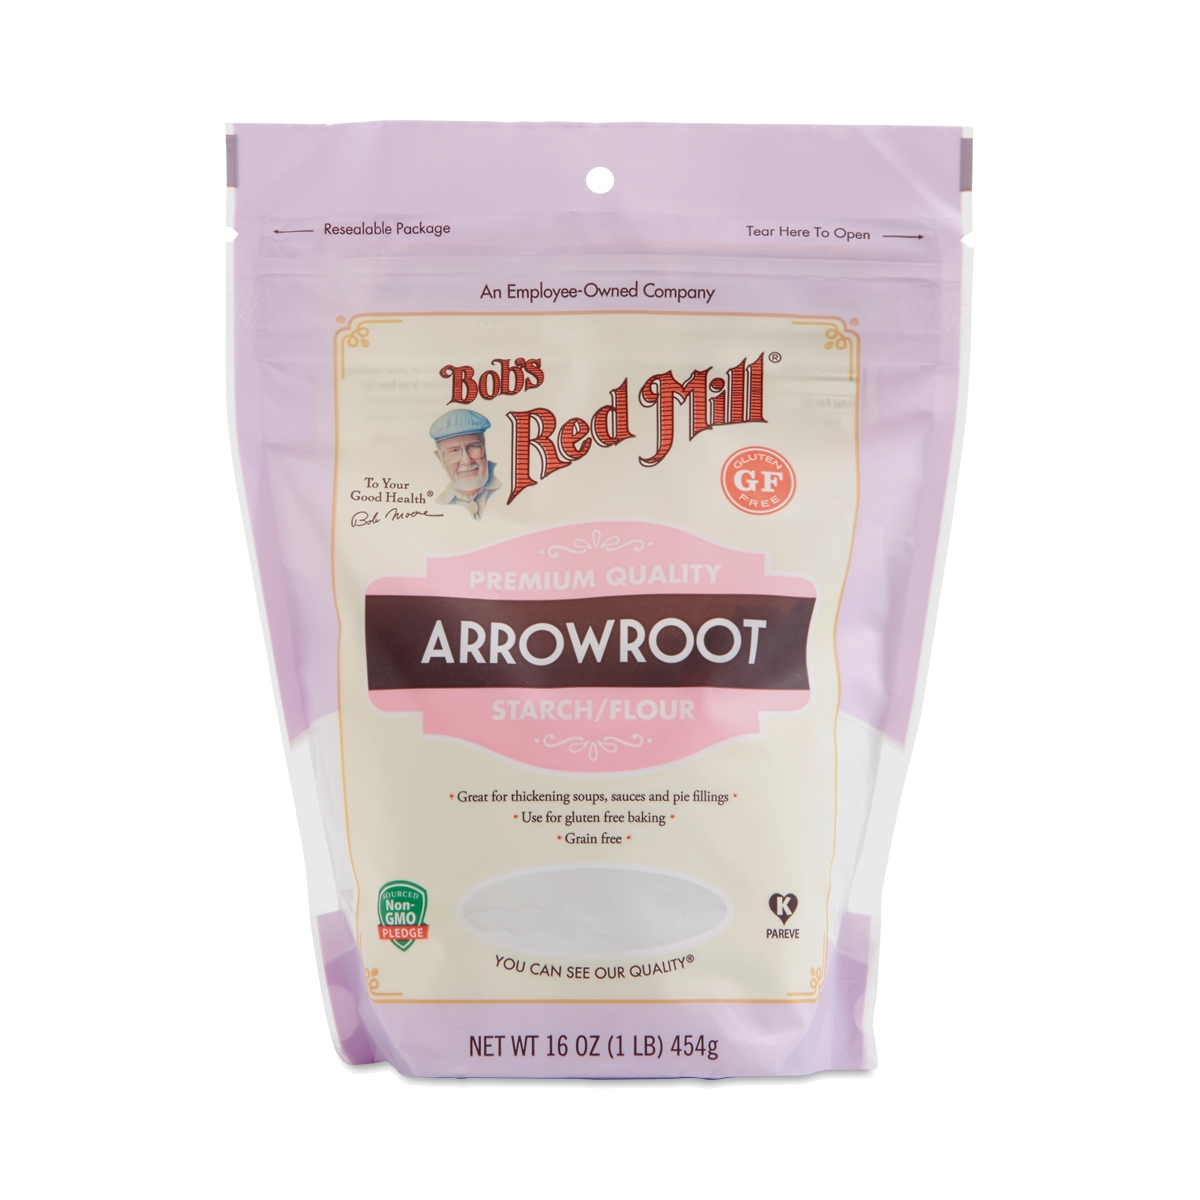 Bob's Red Mill Arrowroot Starch / Flour 16 oz bag